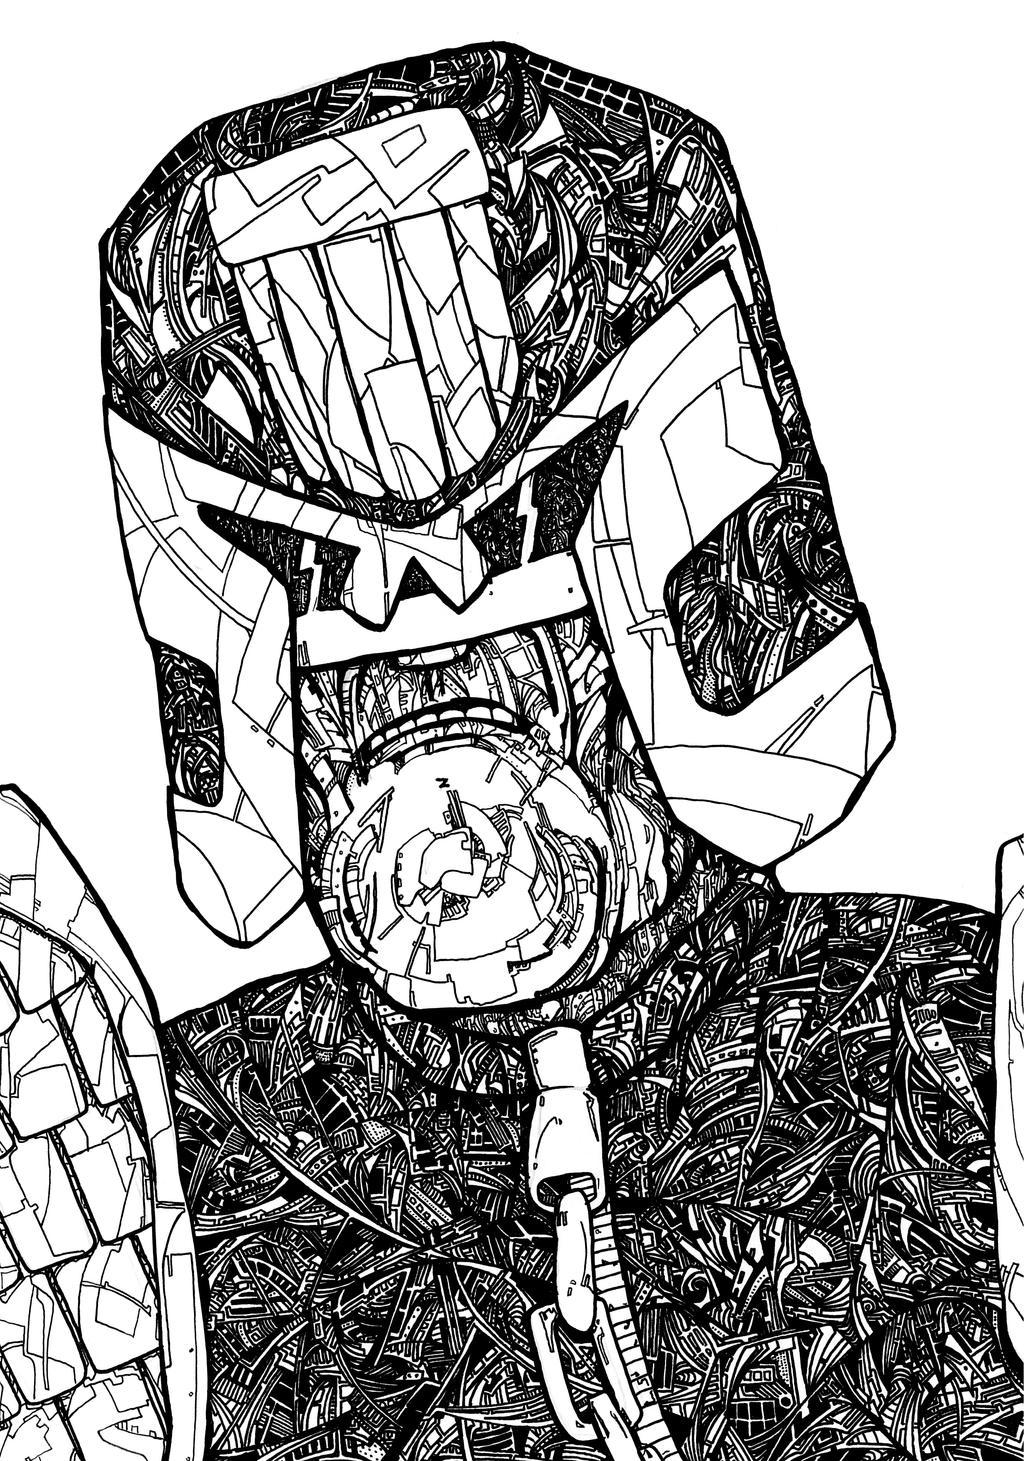 Dreddcorstal by grthink